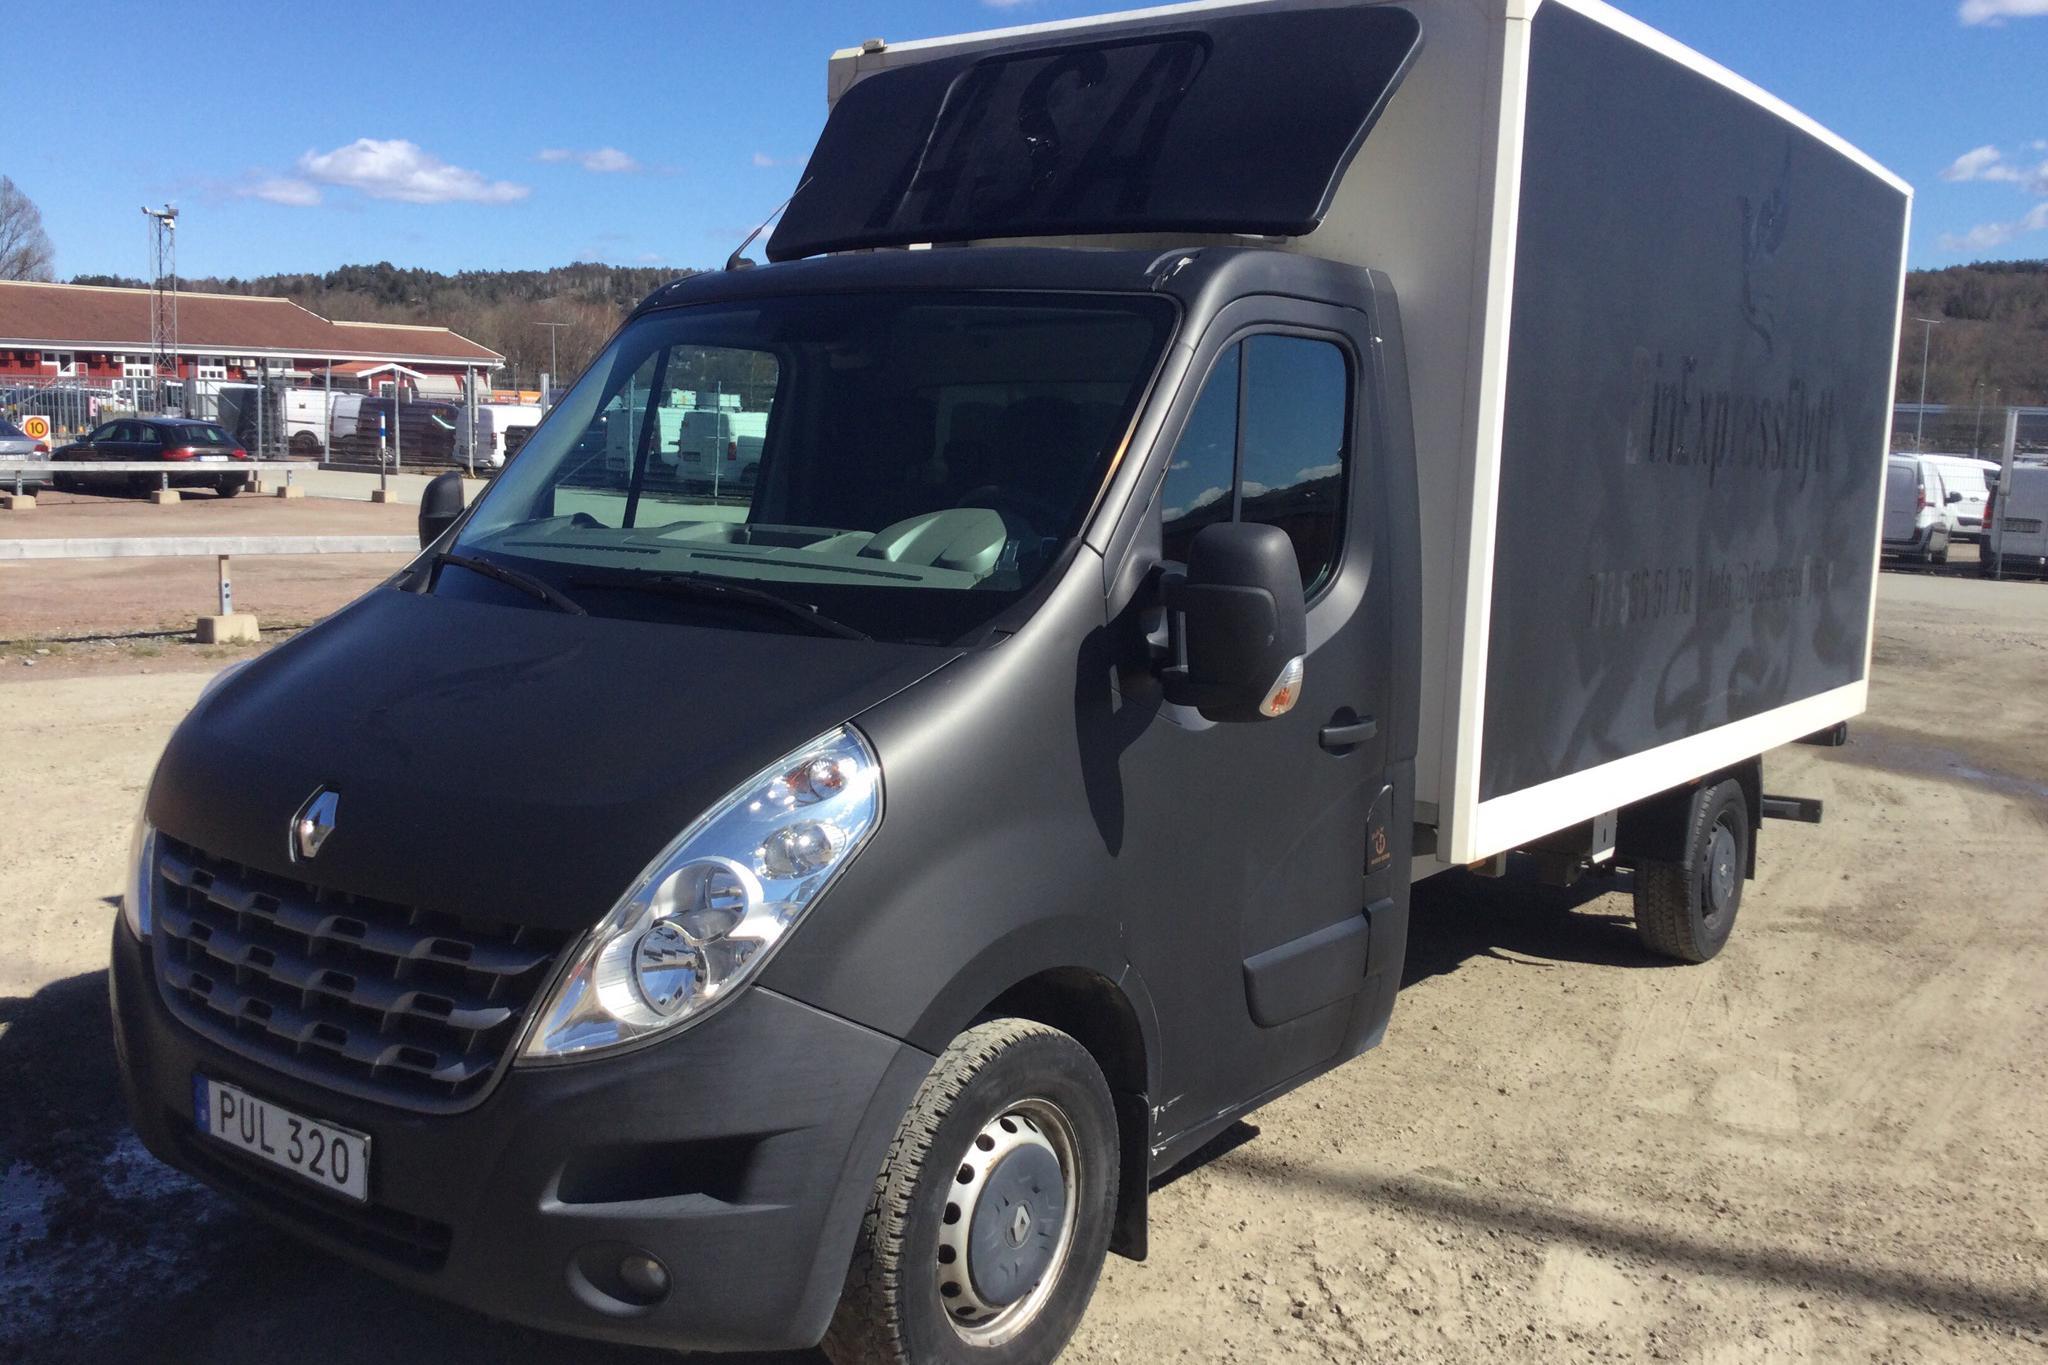 Renault Master 2.3 dCi Volymskåp 2WD (150hk) - 124 090 km - Automatic - 2014